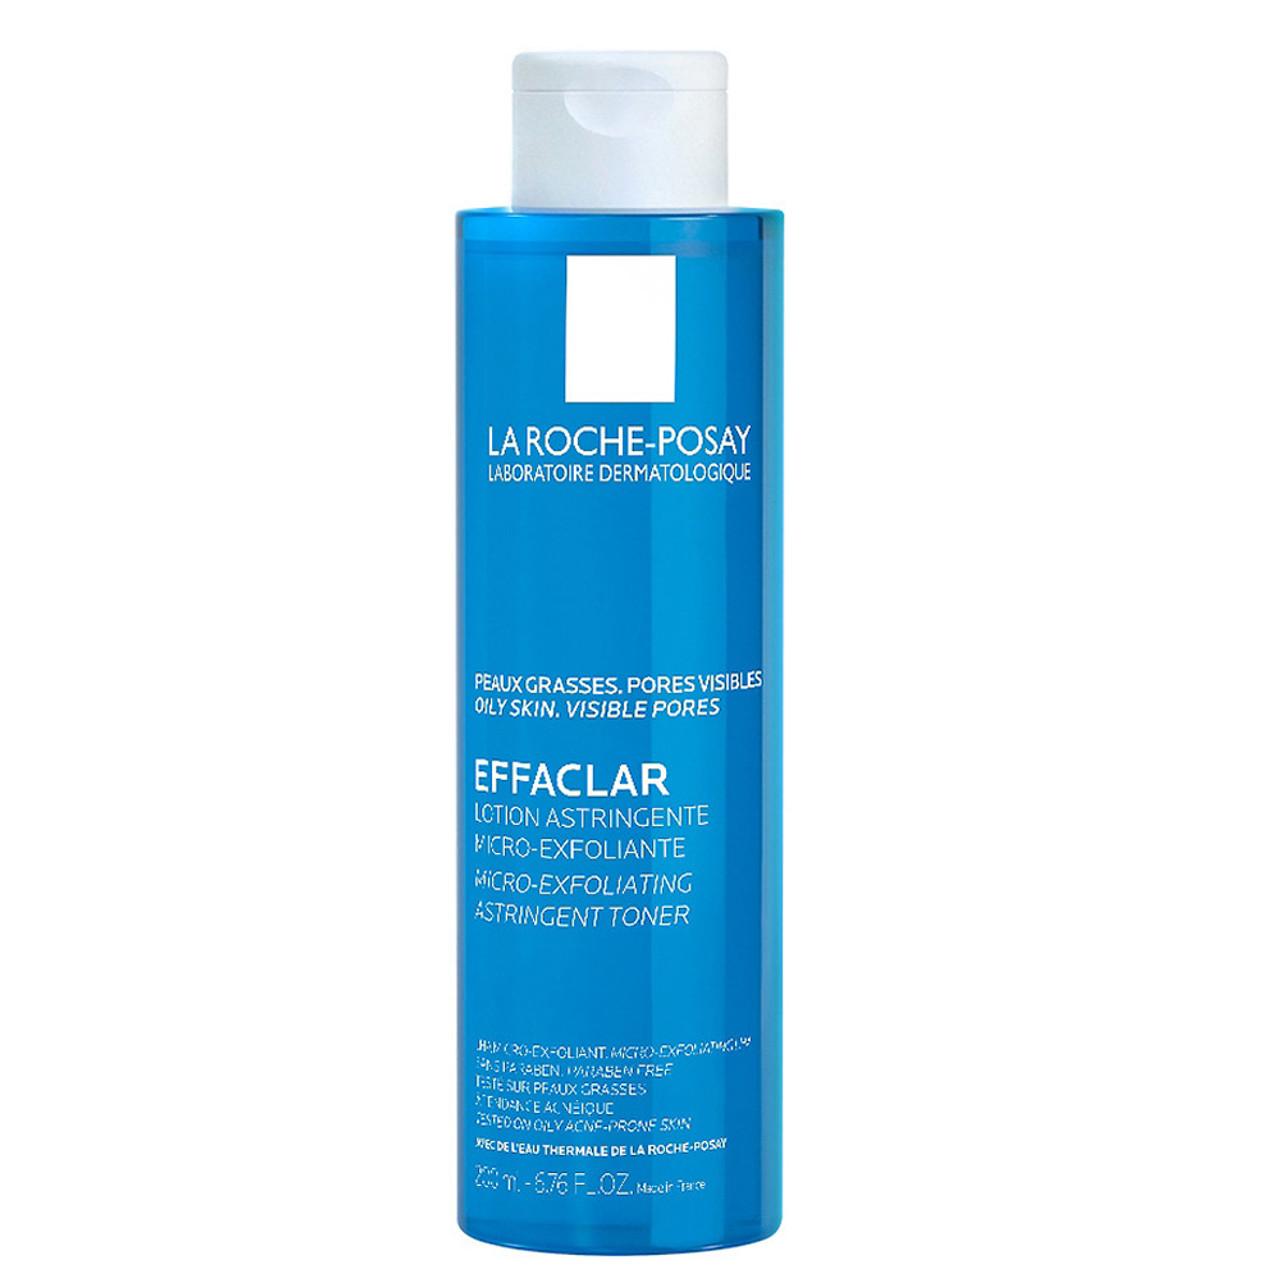 La Roche Posay Effaclar Micro-Exfoliating Astringent Toner BeautifiedYou.com